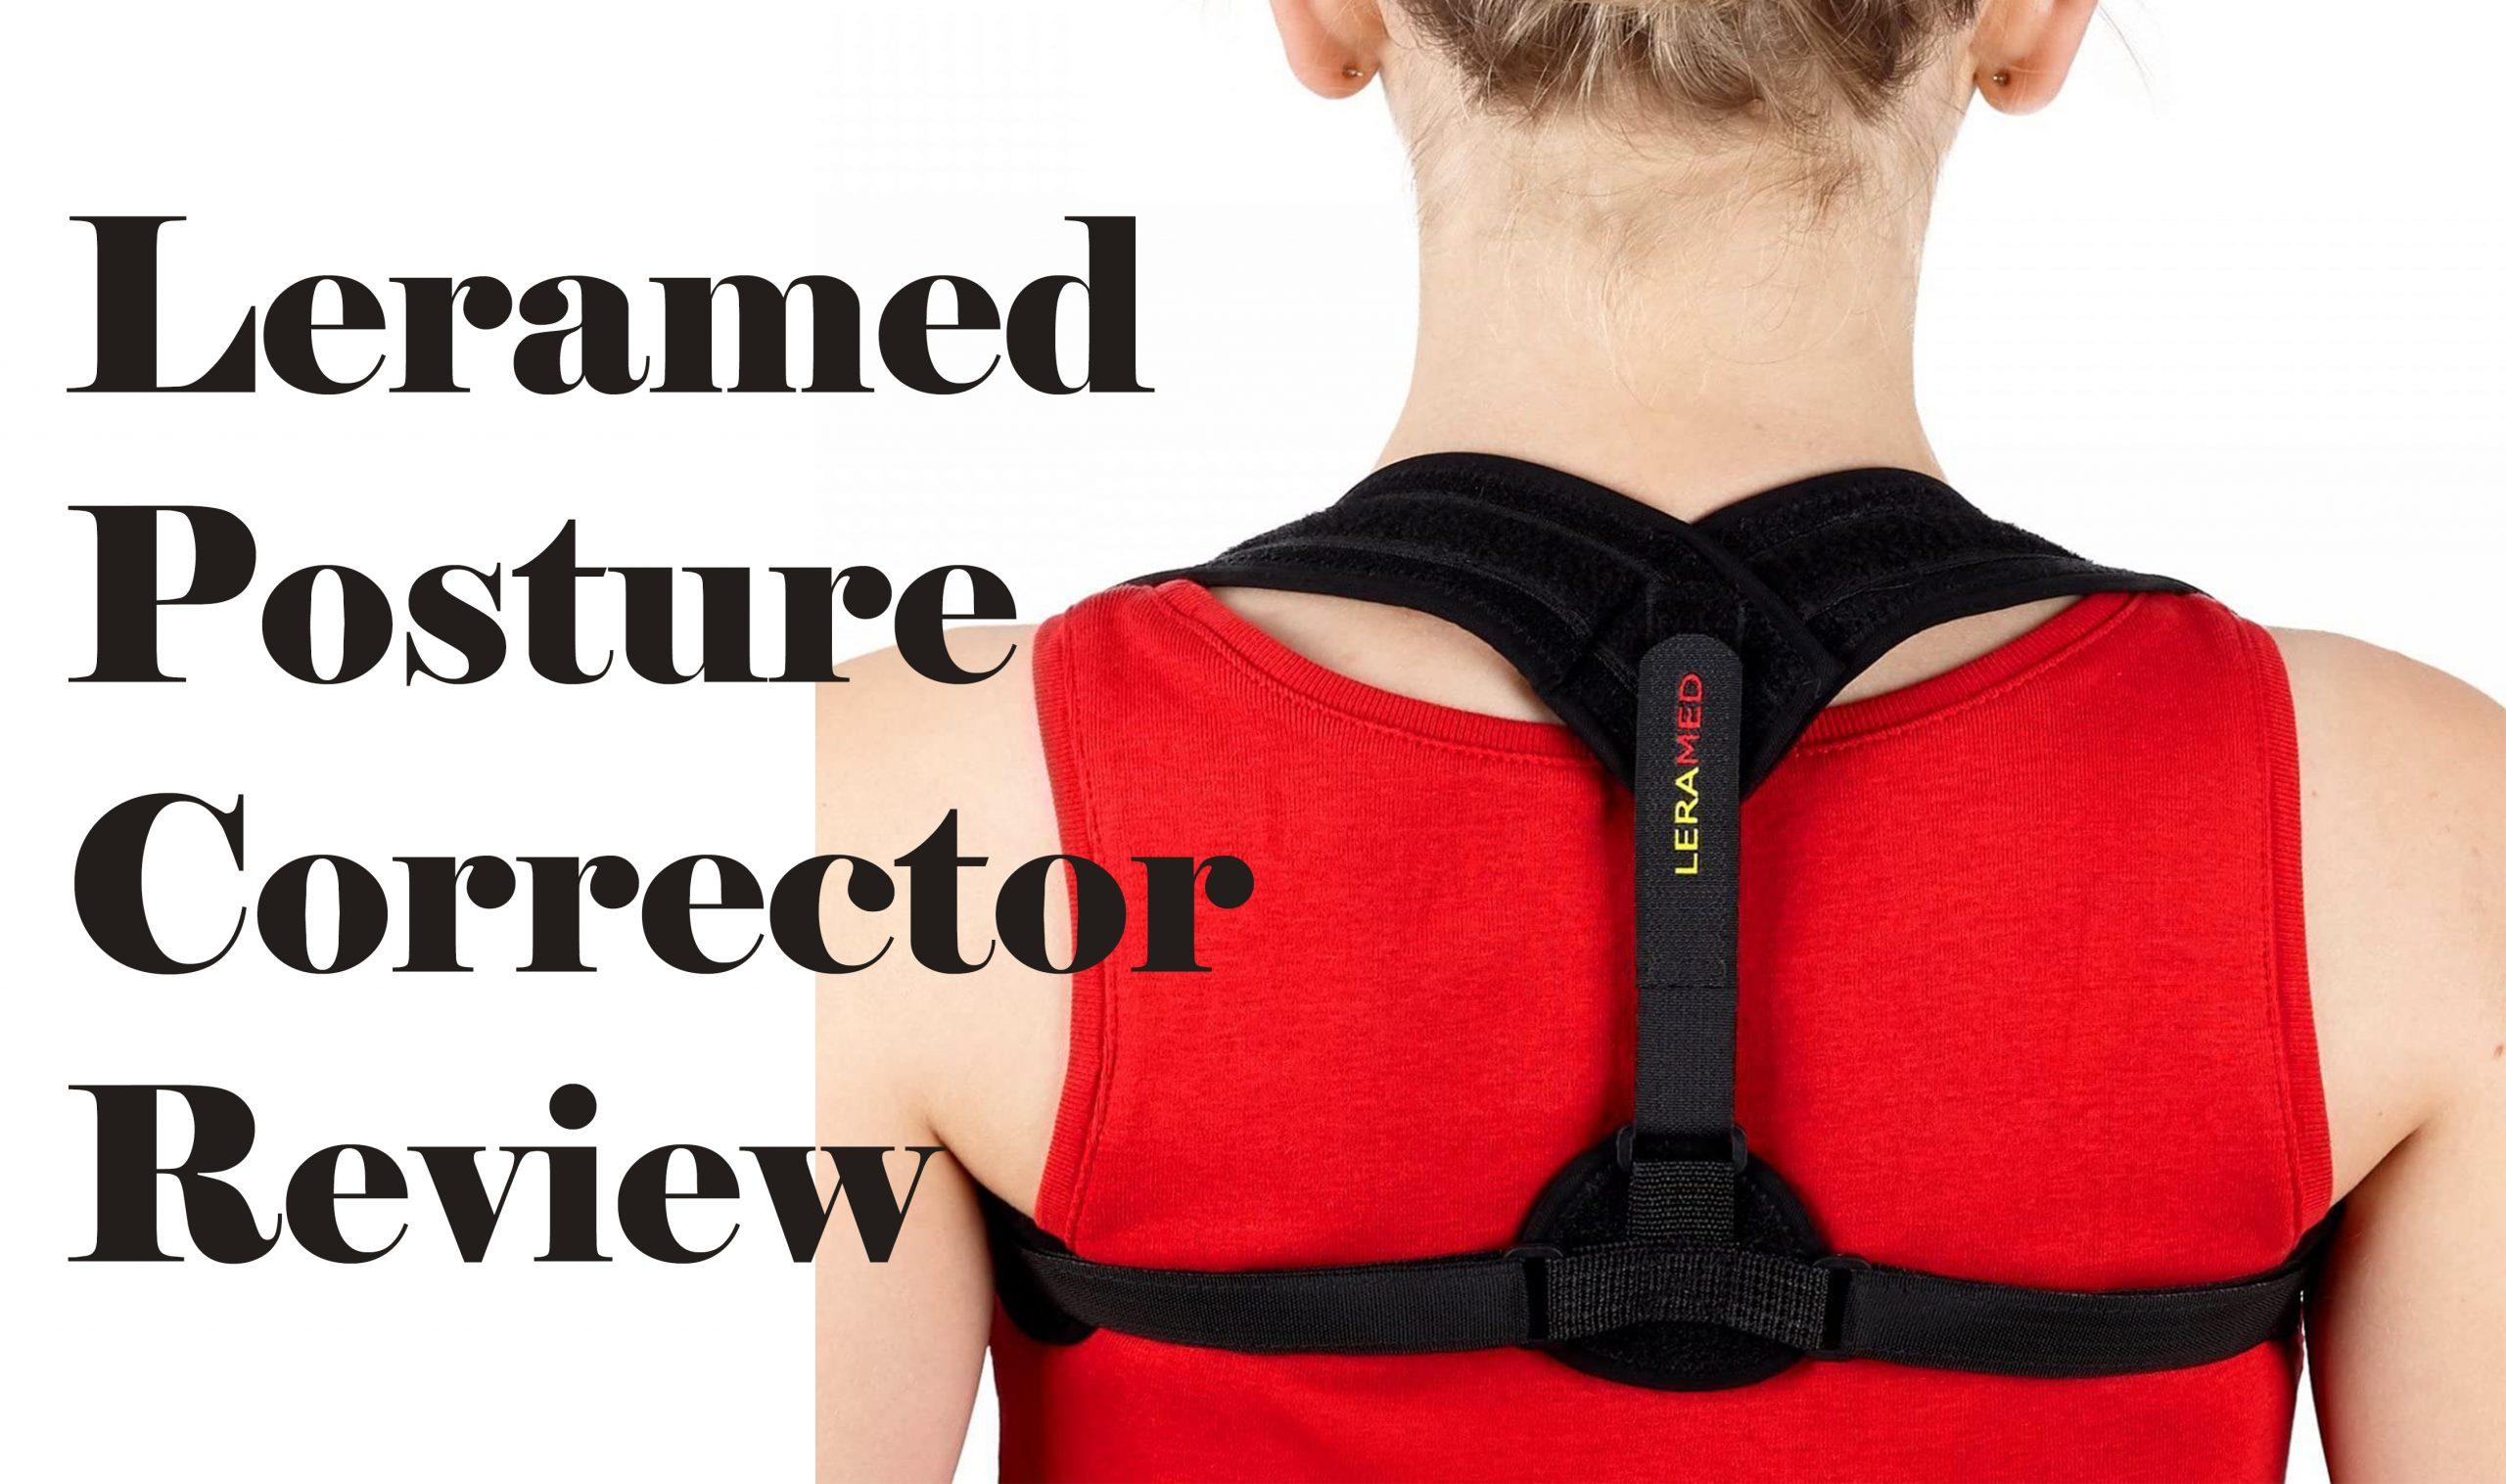 Leramed posture corrector review